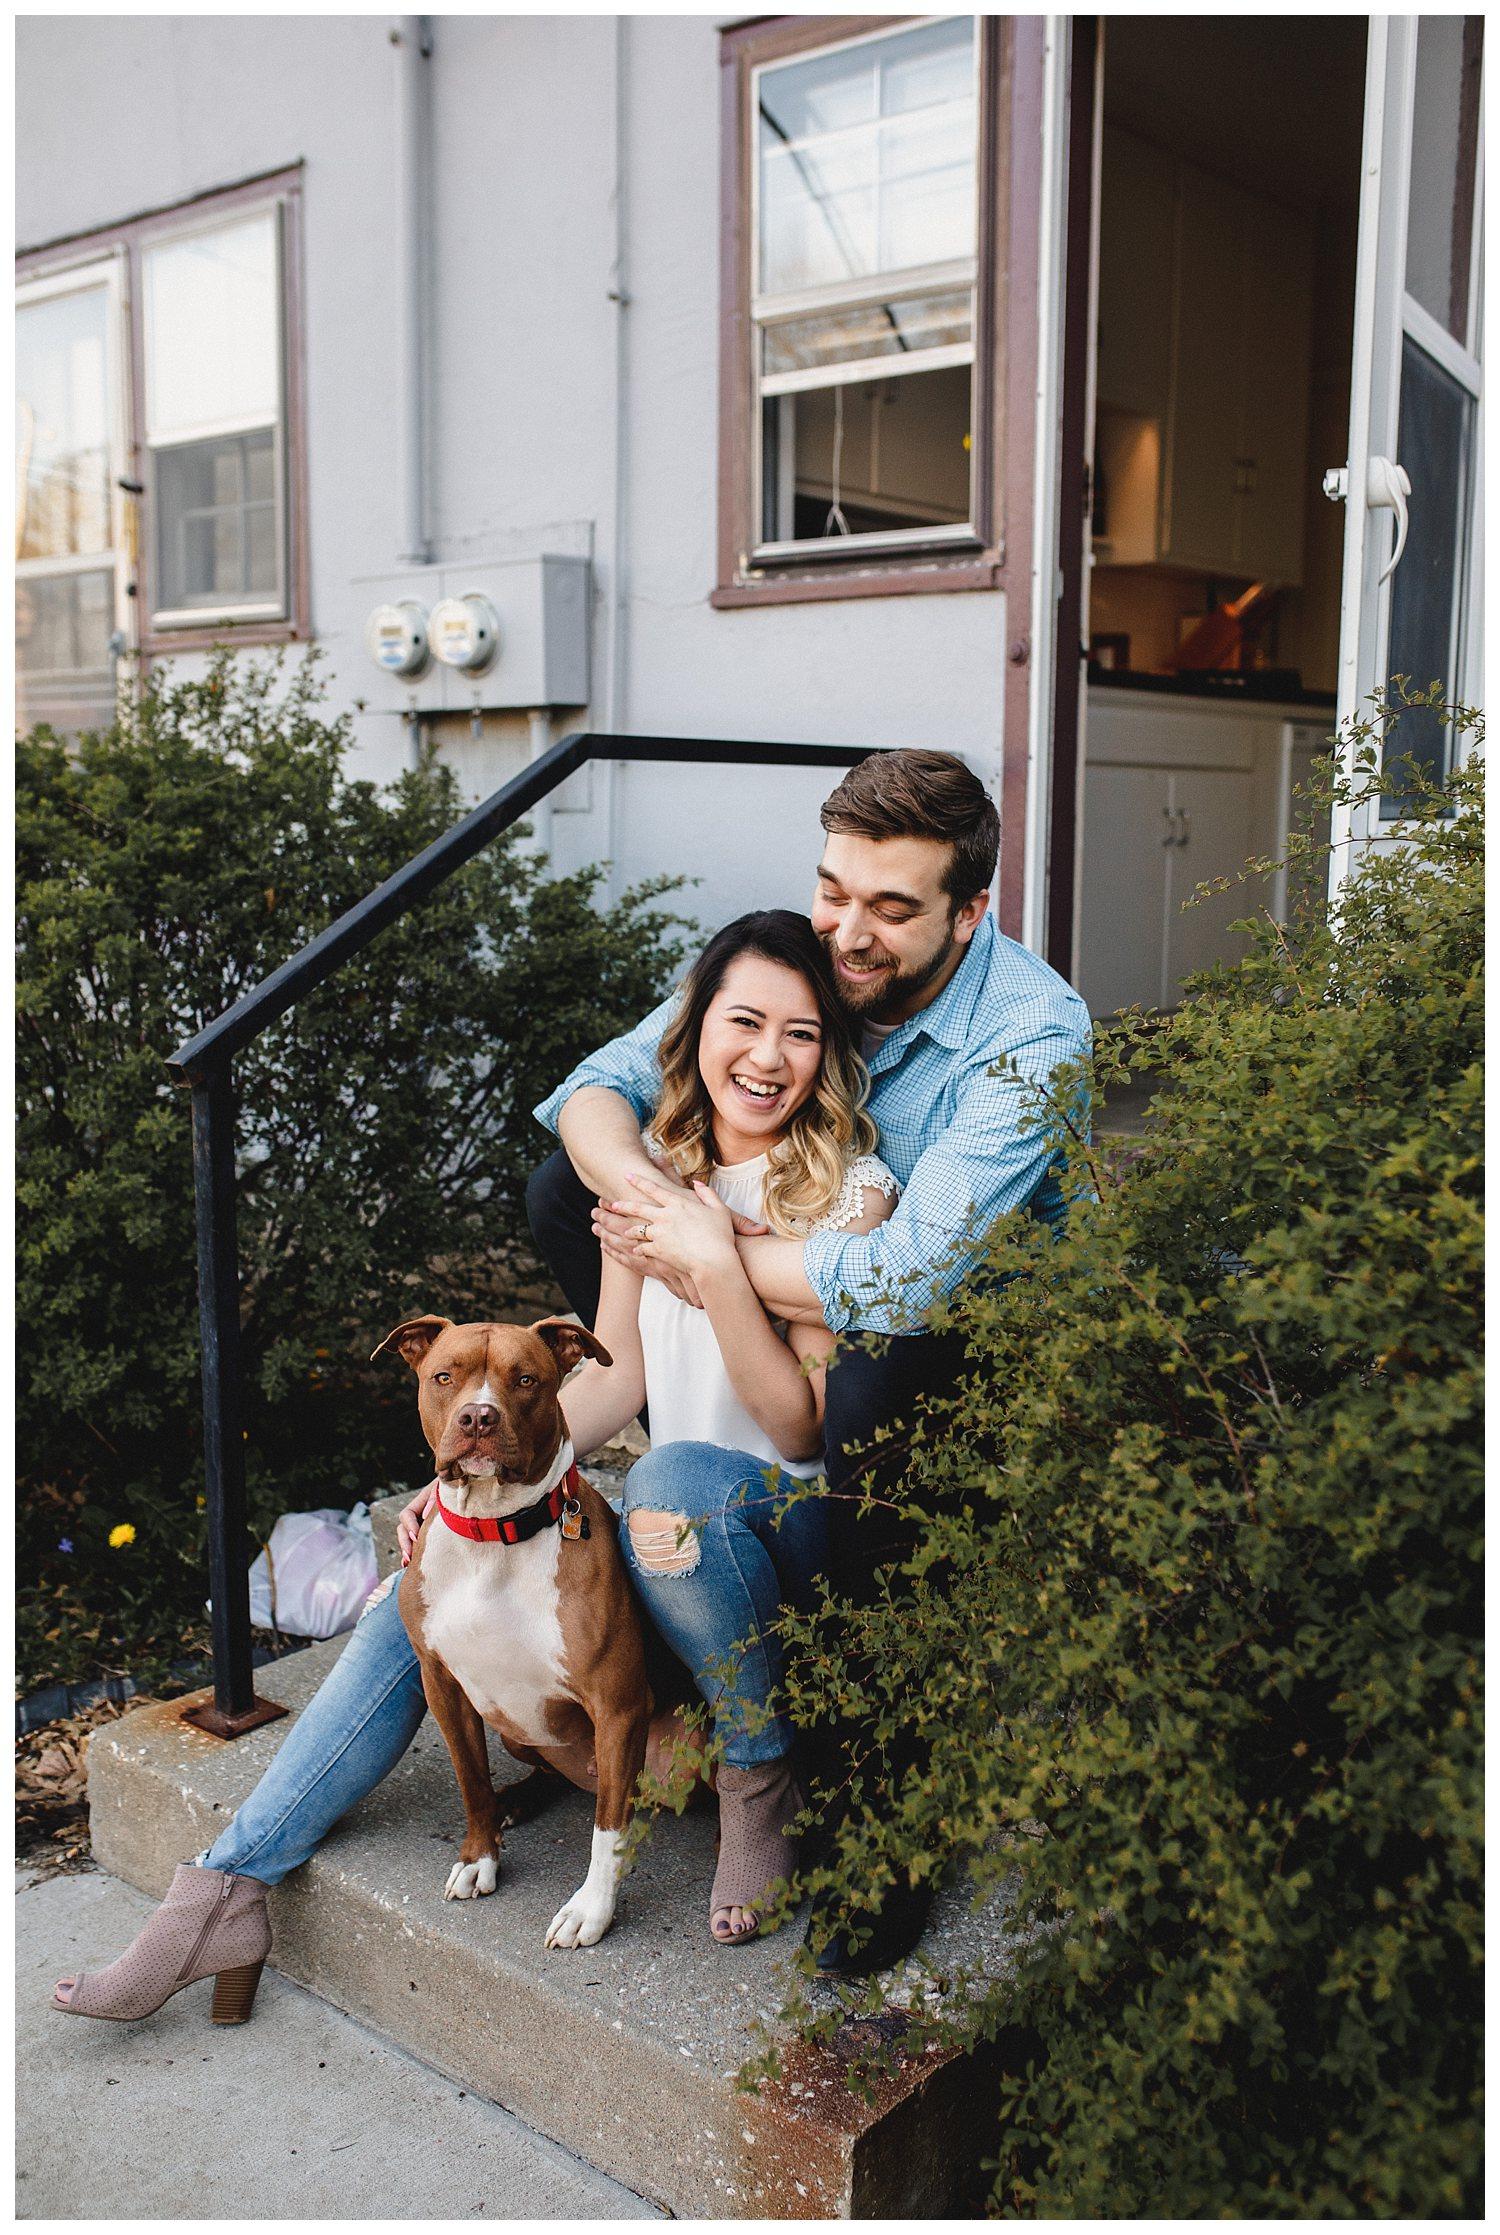 Kelsey_Diane_Photography_Kansas_City_Engagement_Loose_Park_Dog_In_Home_Engagement_Rosa_Joe_Pit_Bull_Loose_Park_0555.jpg